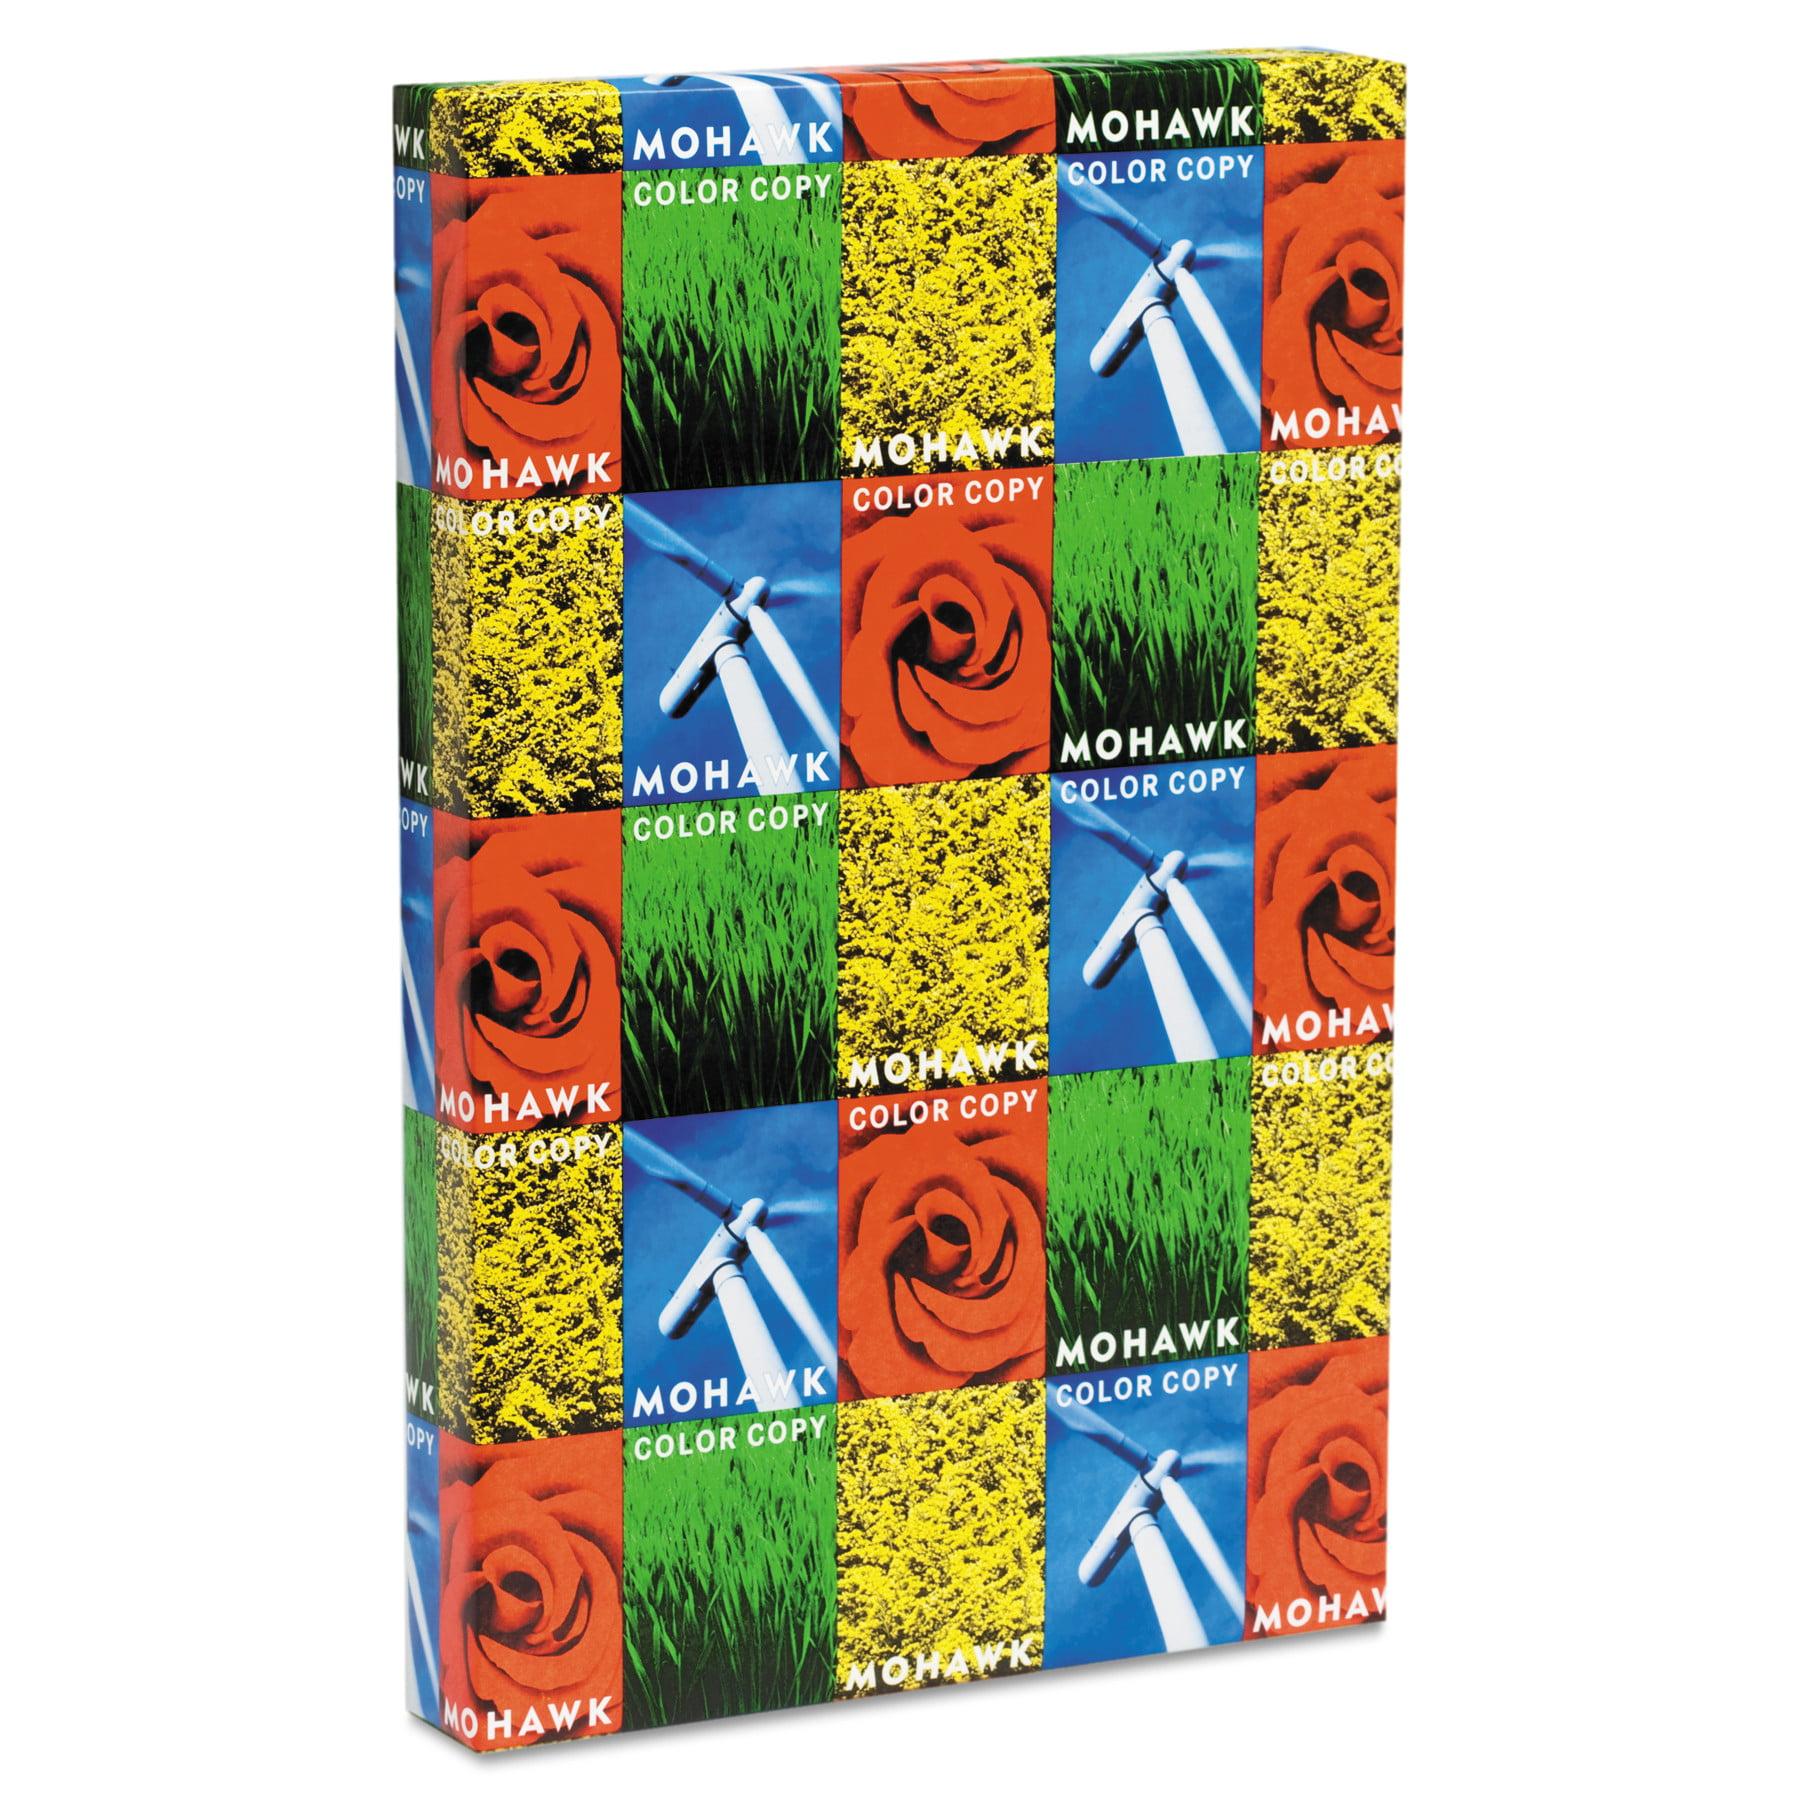 Mohawk Copier 98 Cover, 80lb, 18 x 12, Bright White, 250 Sheets -MOW12216